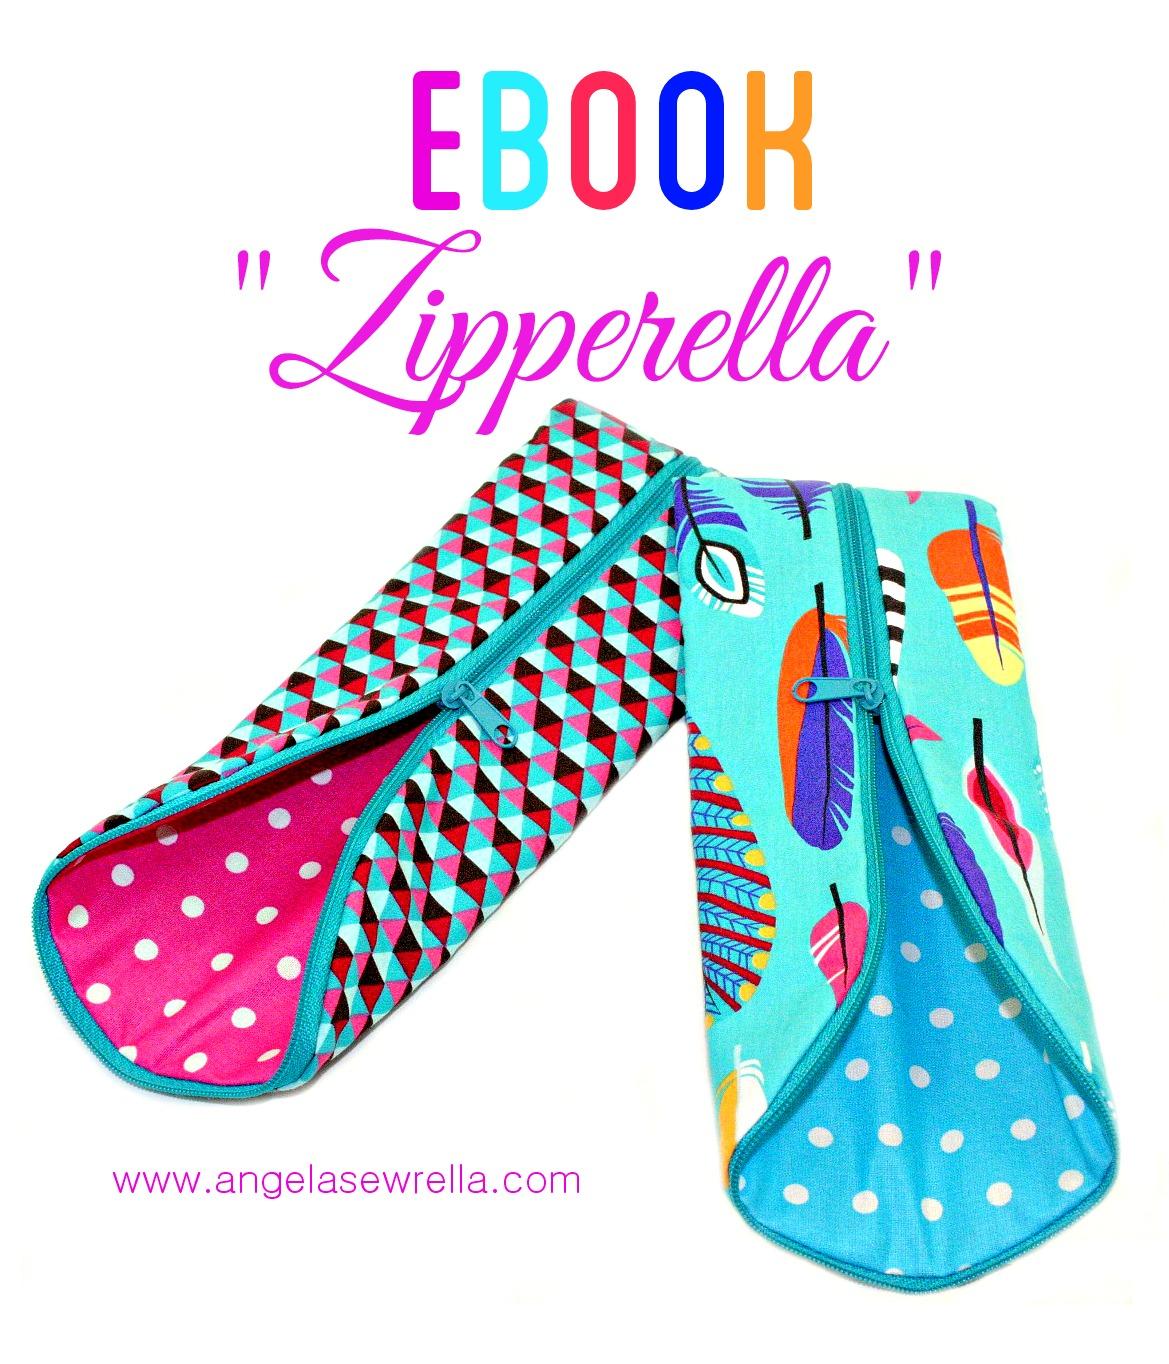 Ebook Zipperella tolles Mäppchen für Handmade Märkte